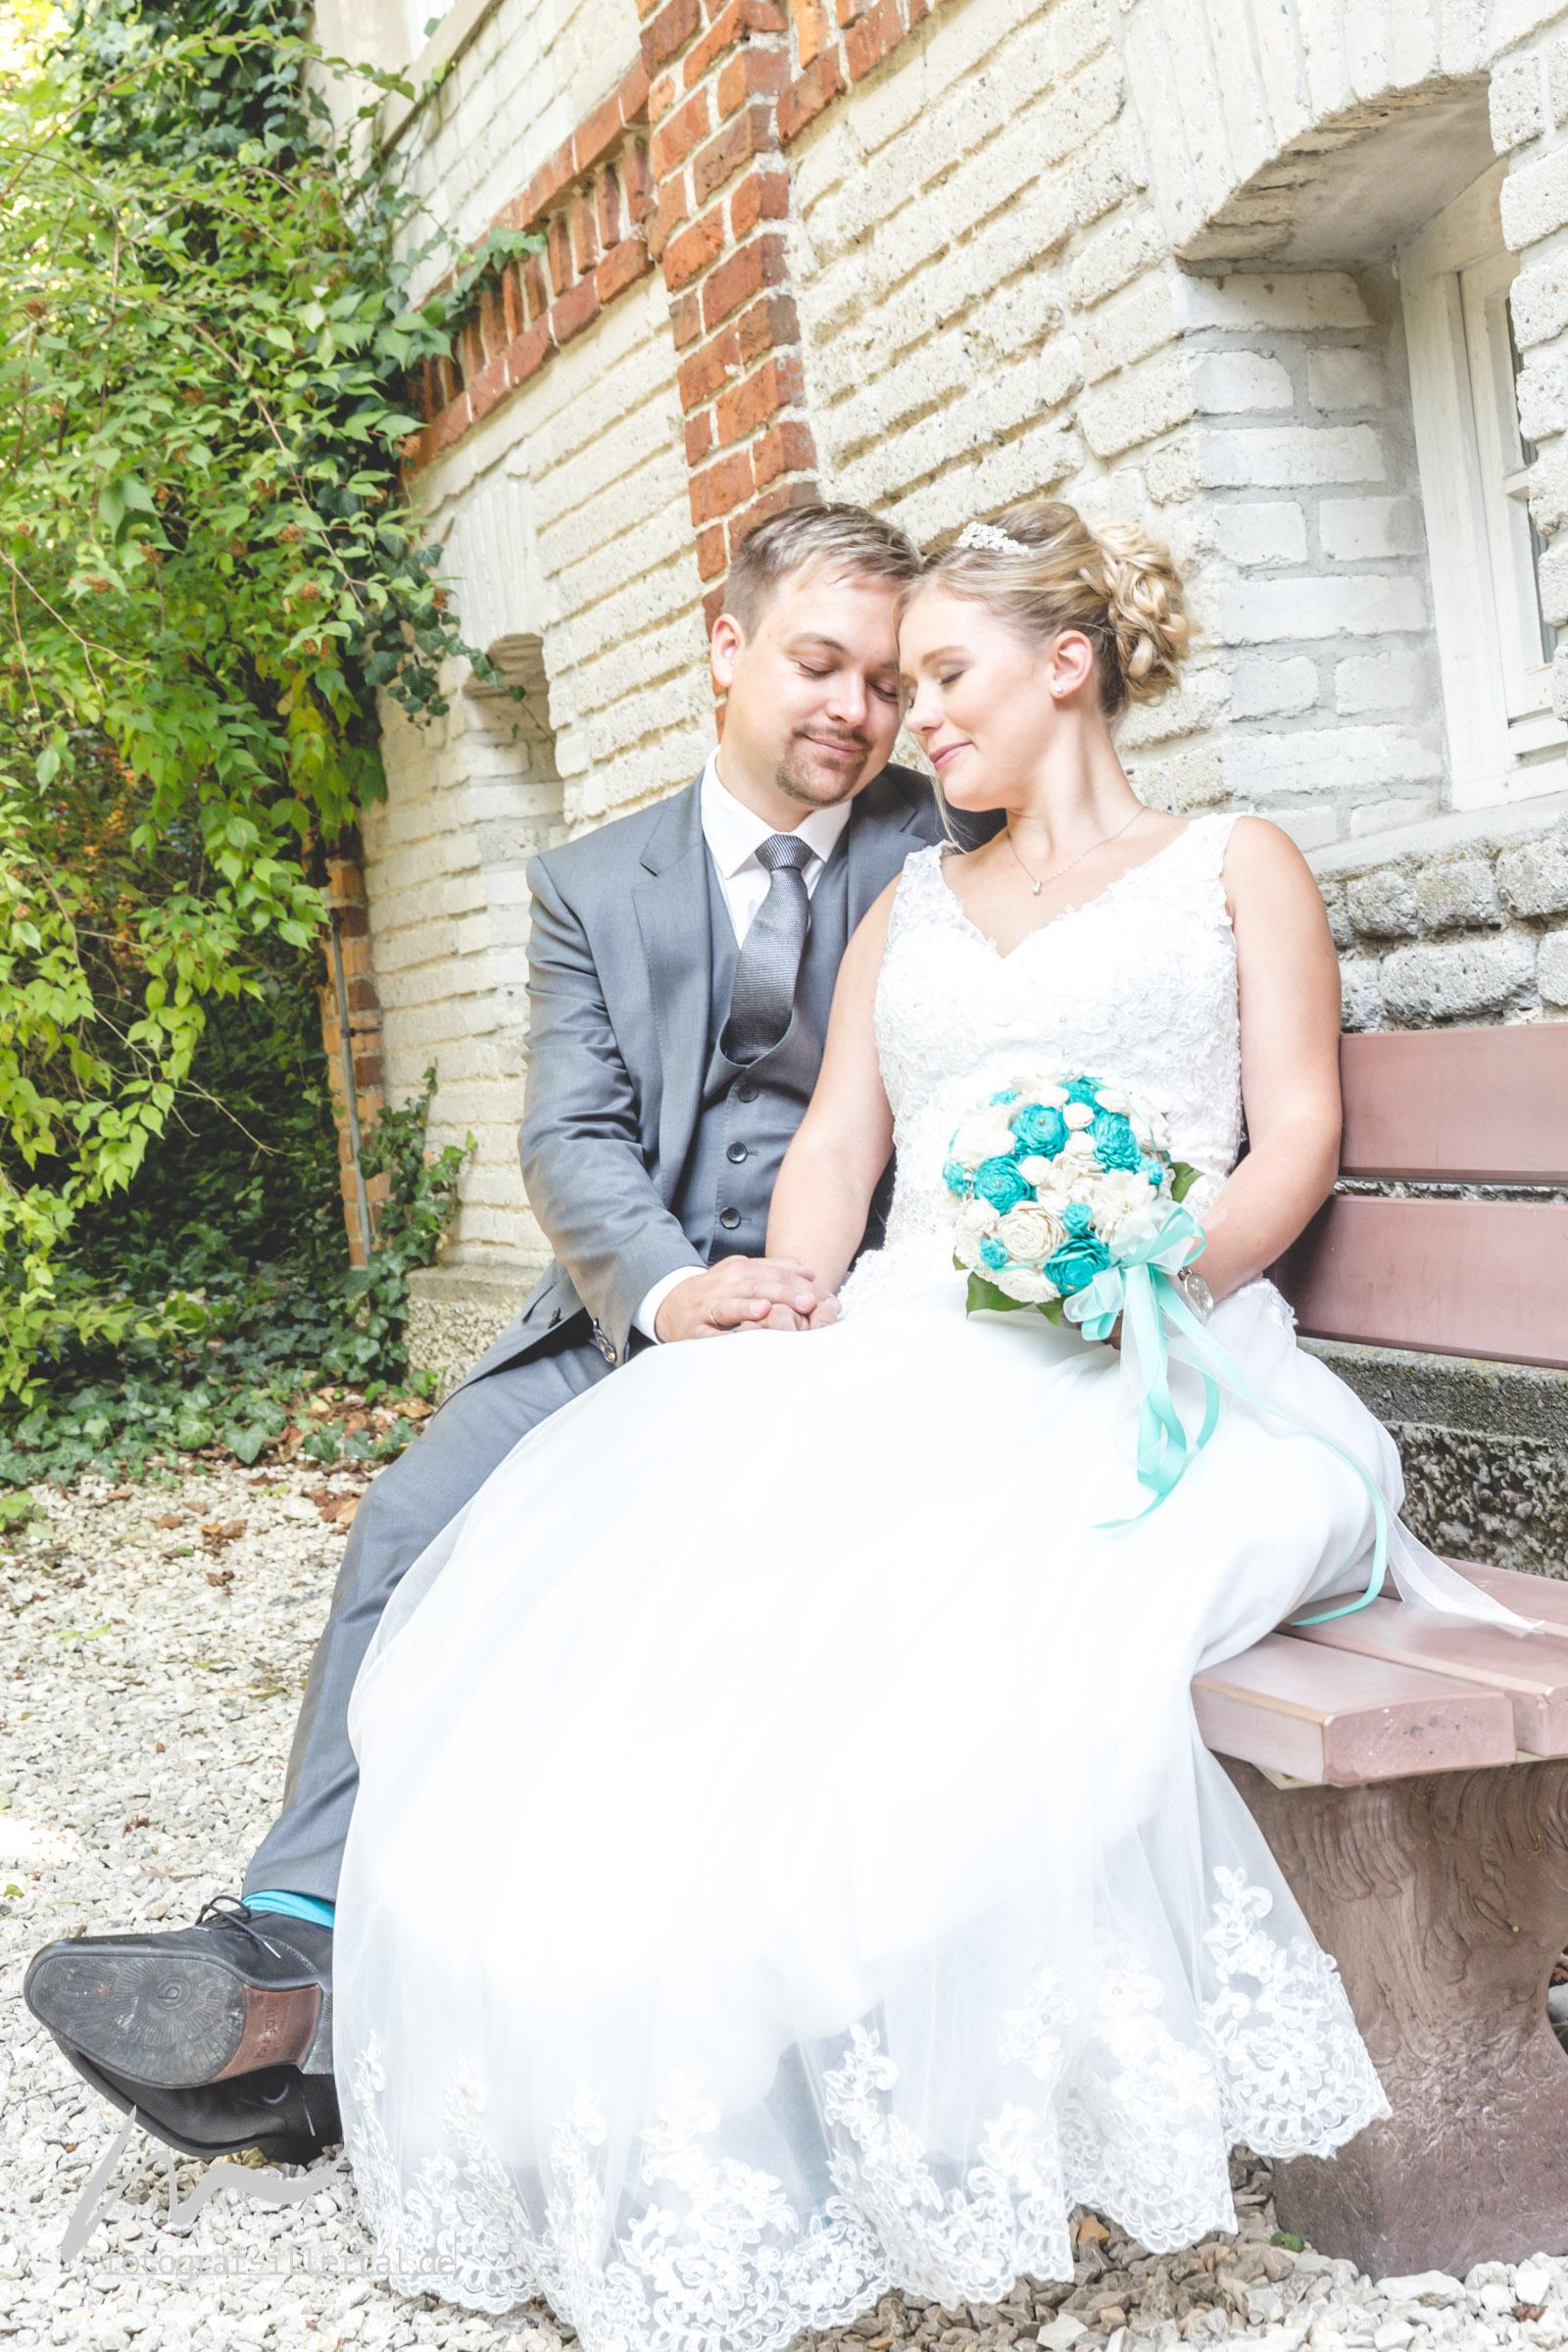 Fotograf Illertal-Christian Miller-Hochzeitsfotografie-_MG_8243